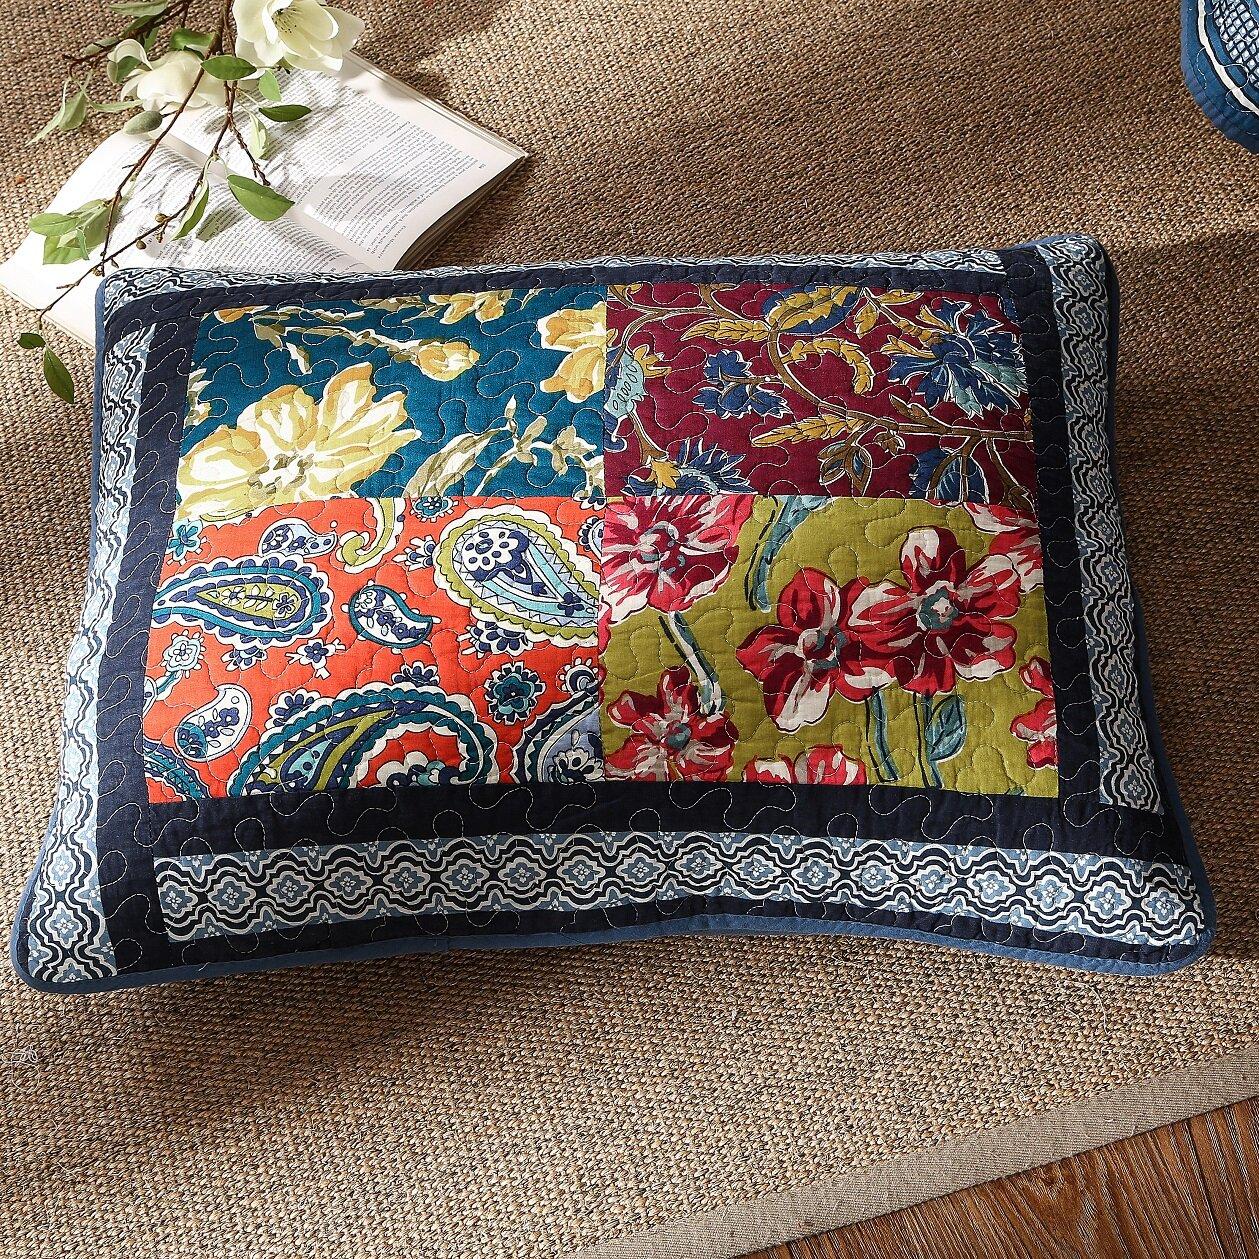 Dada Bedding Bohemian Floral Real Patchwork Quilt Set